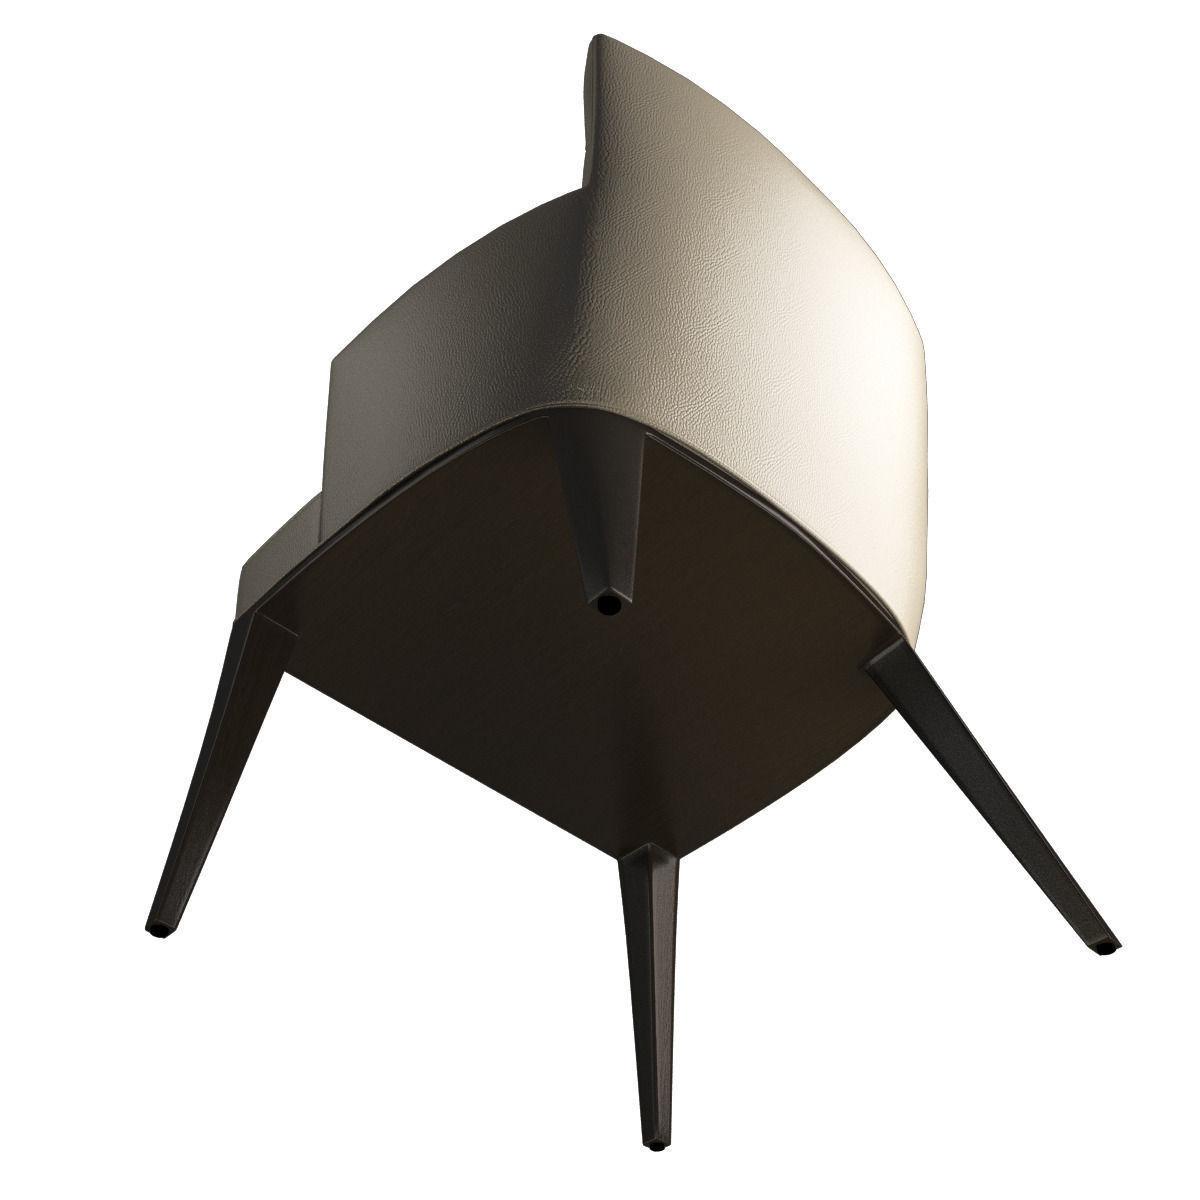 Selva Dolly Chair 3d Model Max Cgtrader Com